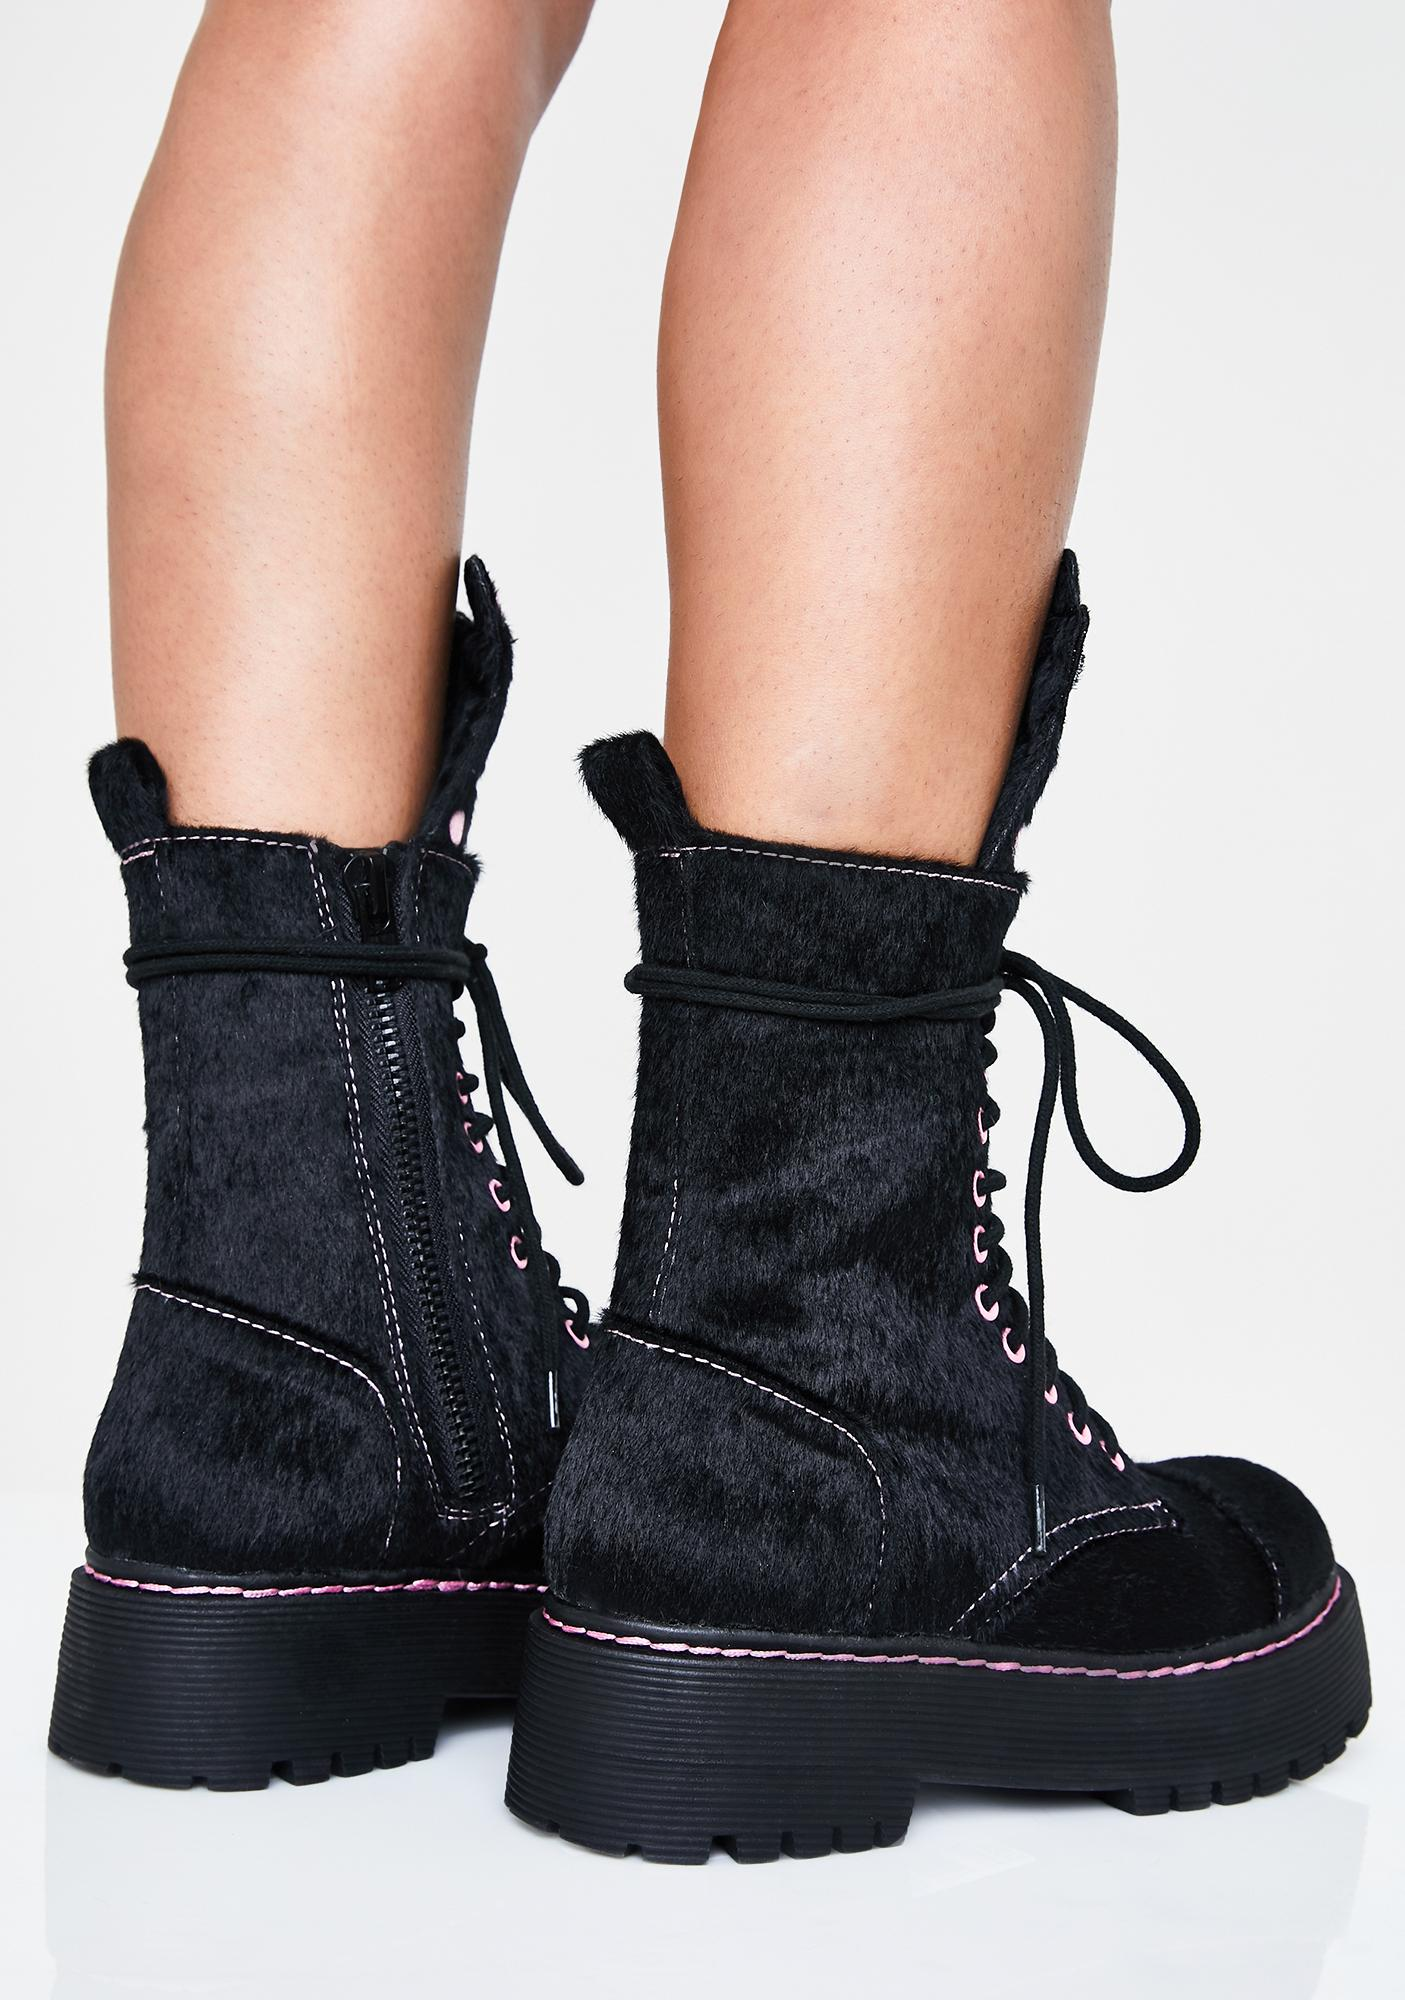 Sugar Thrillz Best Furrends Combat Boots